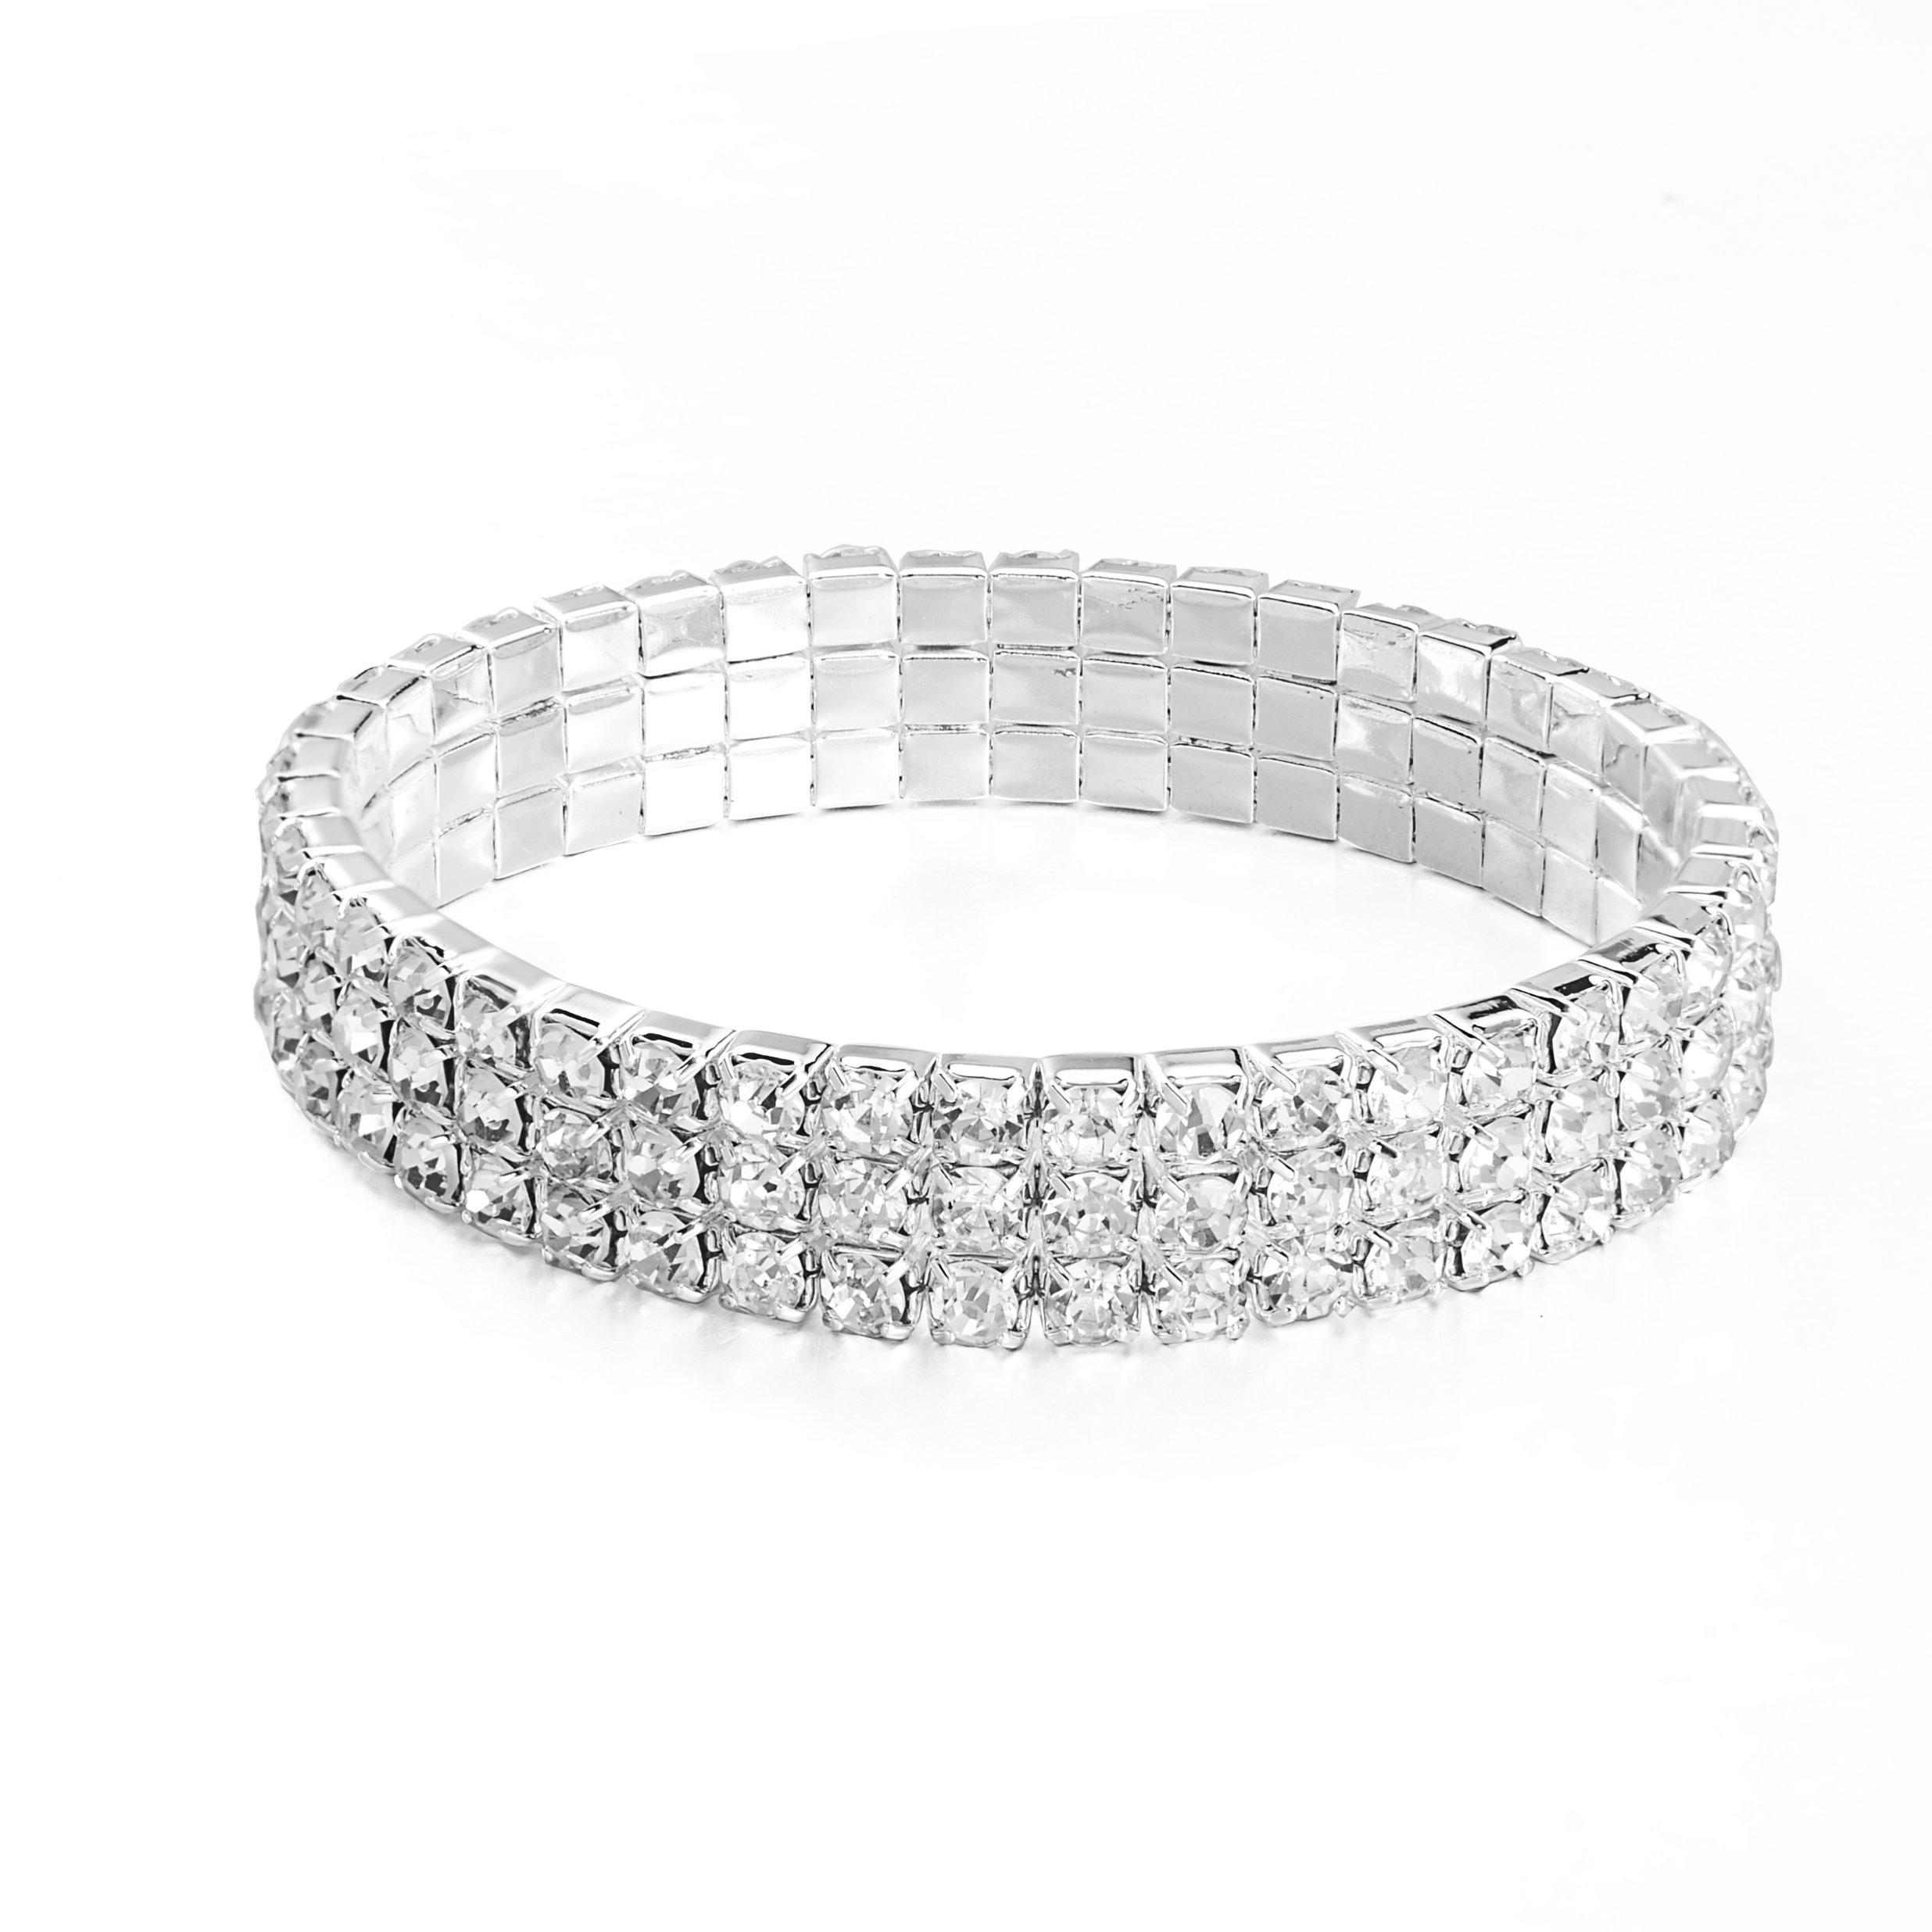 JEWMAY Yumei Jewelry 3-Strand Rhinestone Stretch Bracelet Silver-tone Wedding Tennis Bracelet Sparkling Bridal Bangle Ankelt,6.5'' - 8''